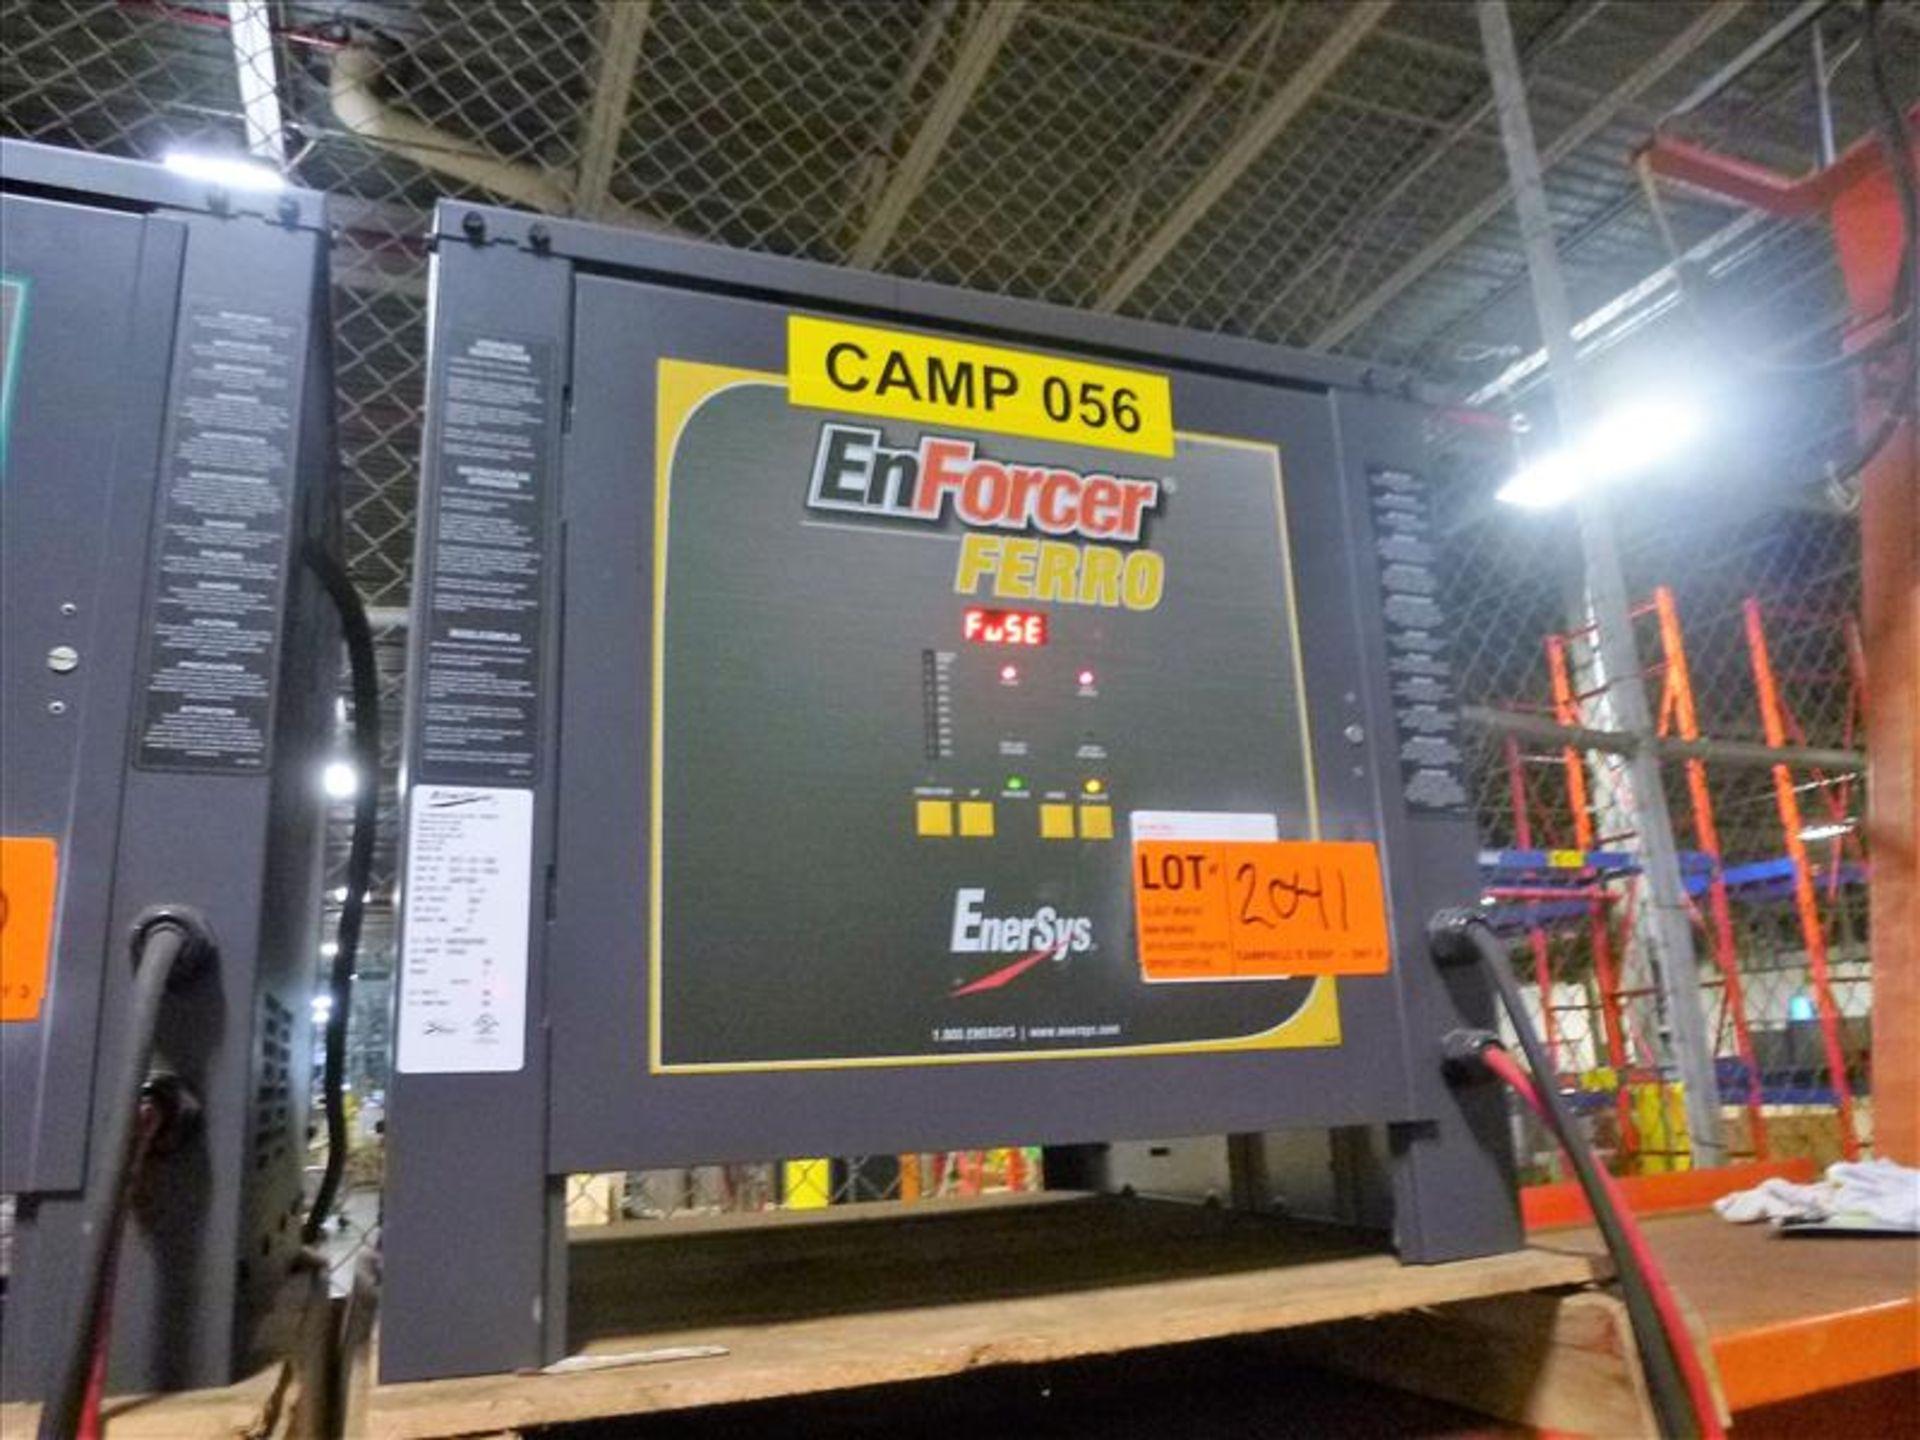 Lot 2041 - Enforcer Ferro battery charger, 48V [Material Handling]